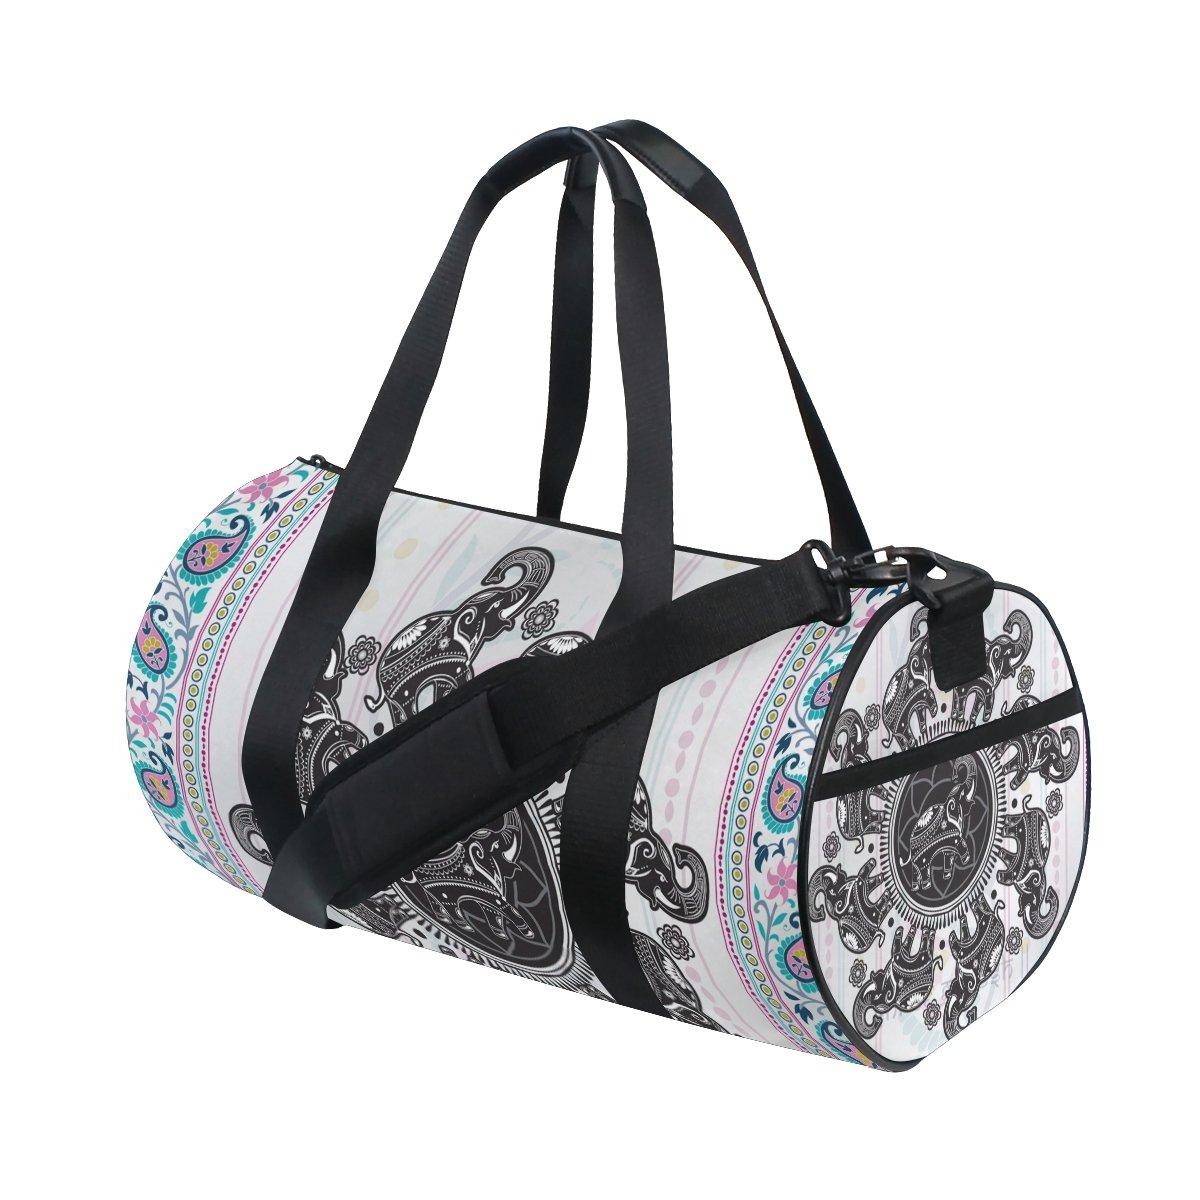 Hippie Indian Elephant Mandala Sports Duffel Bags, Travel Gym Fitness Bag